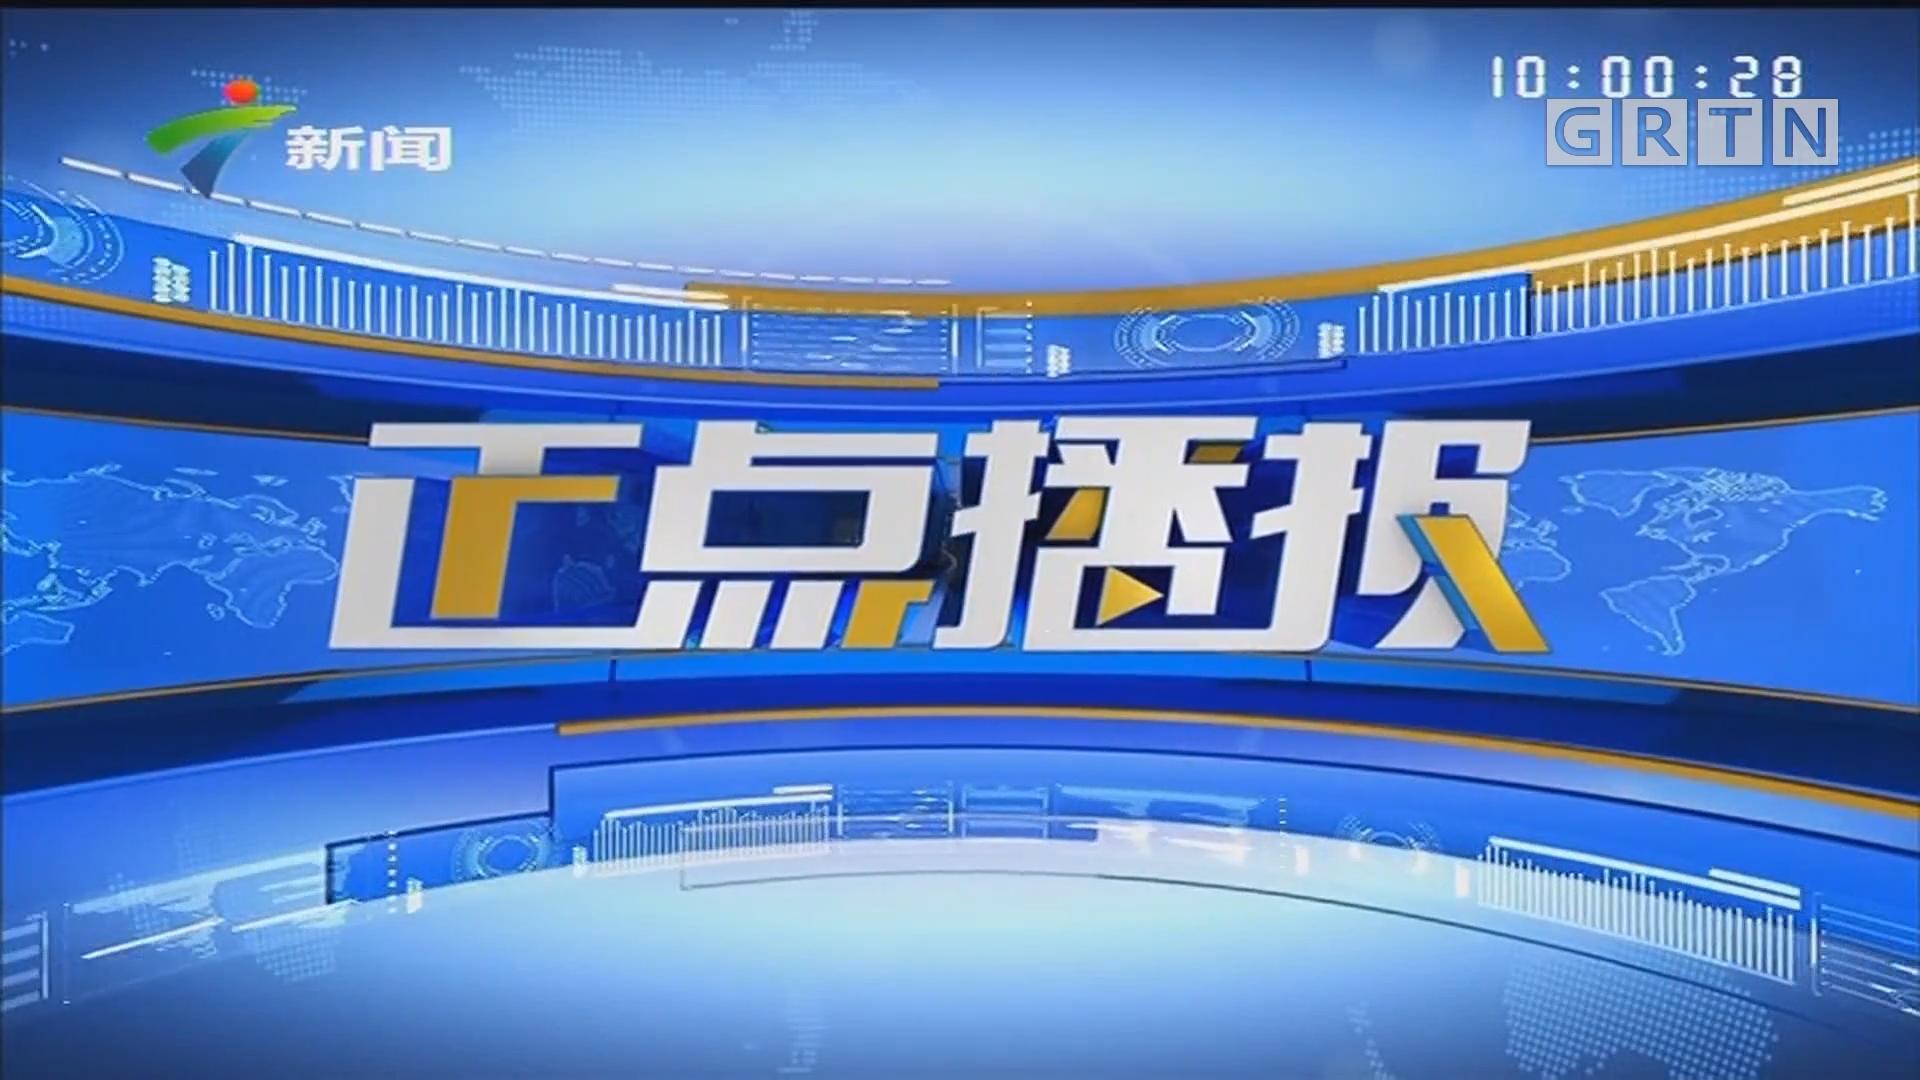 [HD][2019-11-16]正點播報:香港特區政府舉行跨部門記者會:特區政府將采取更果斷措施處理局勢